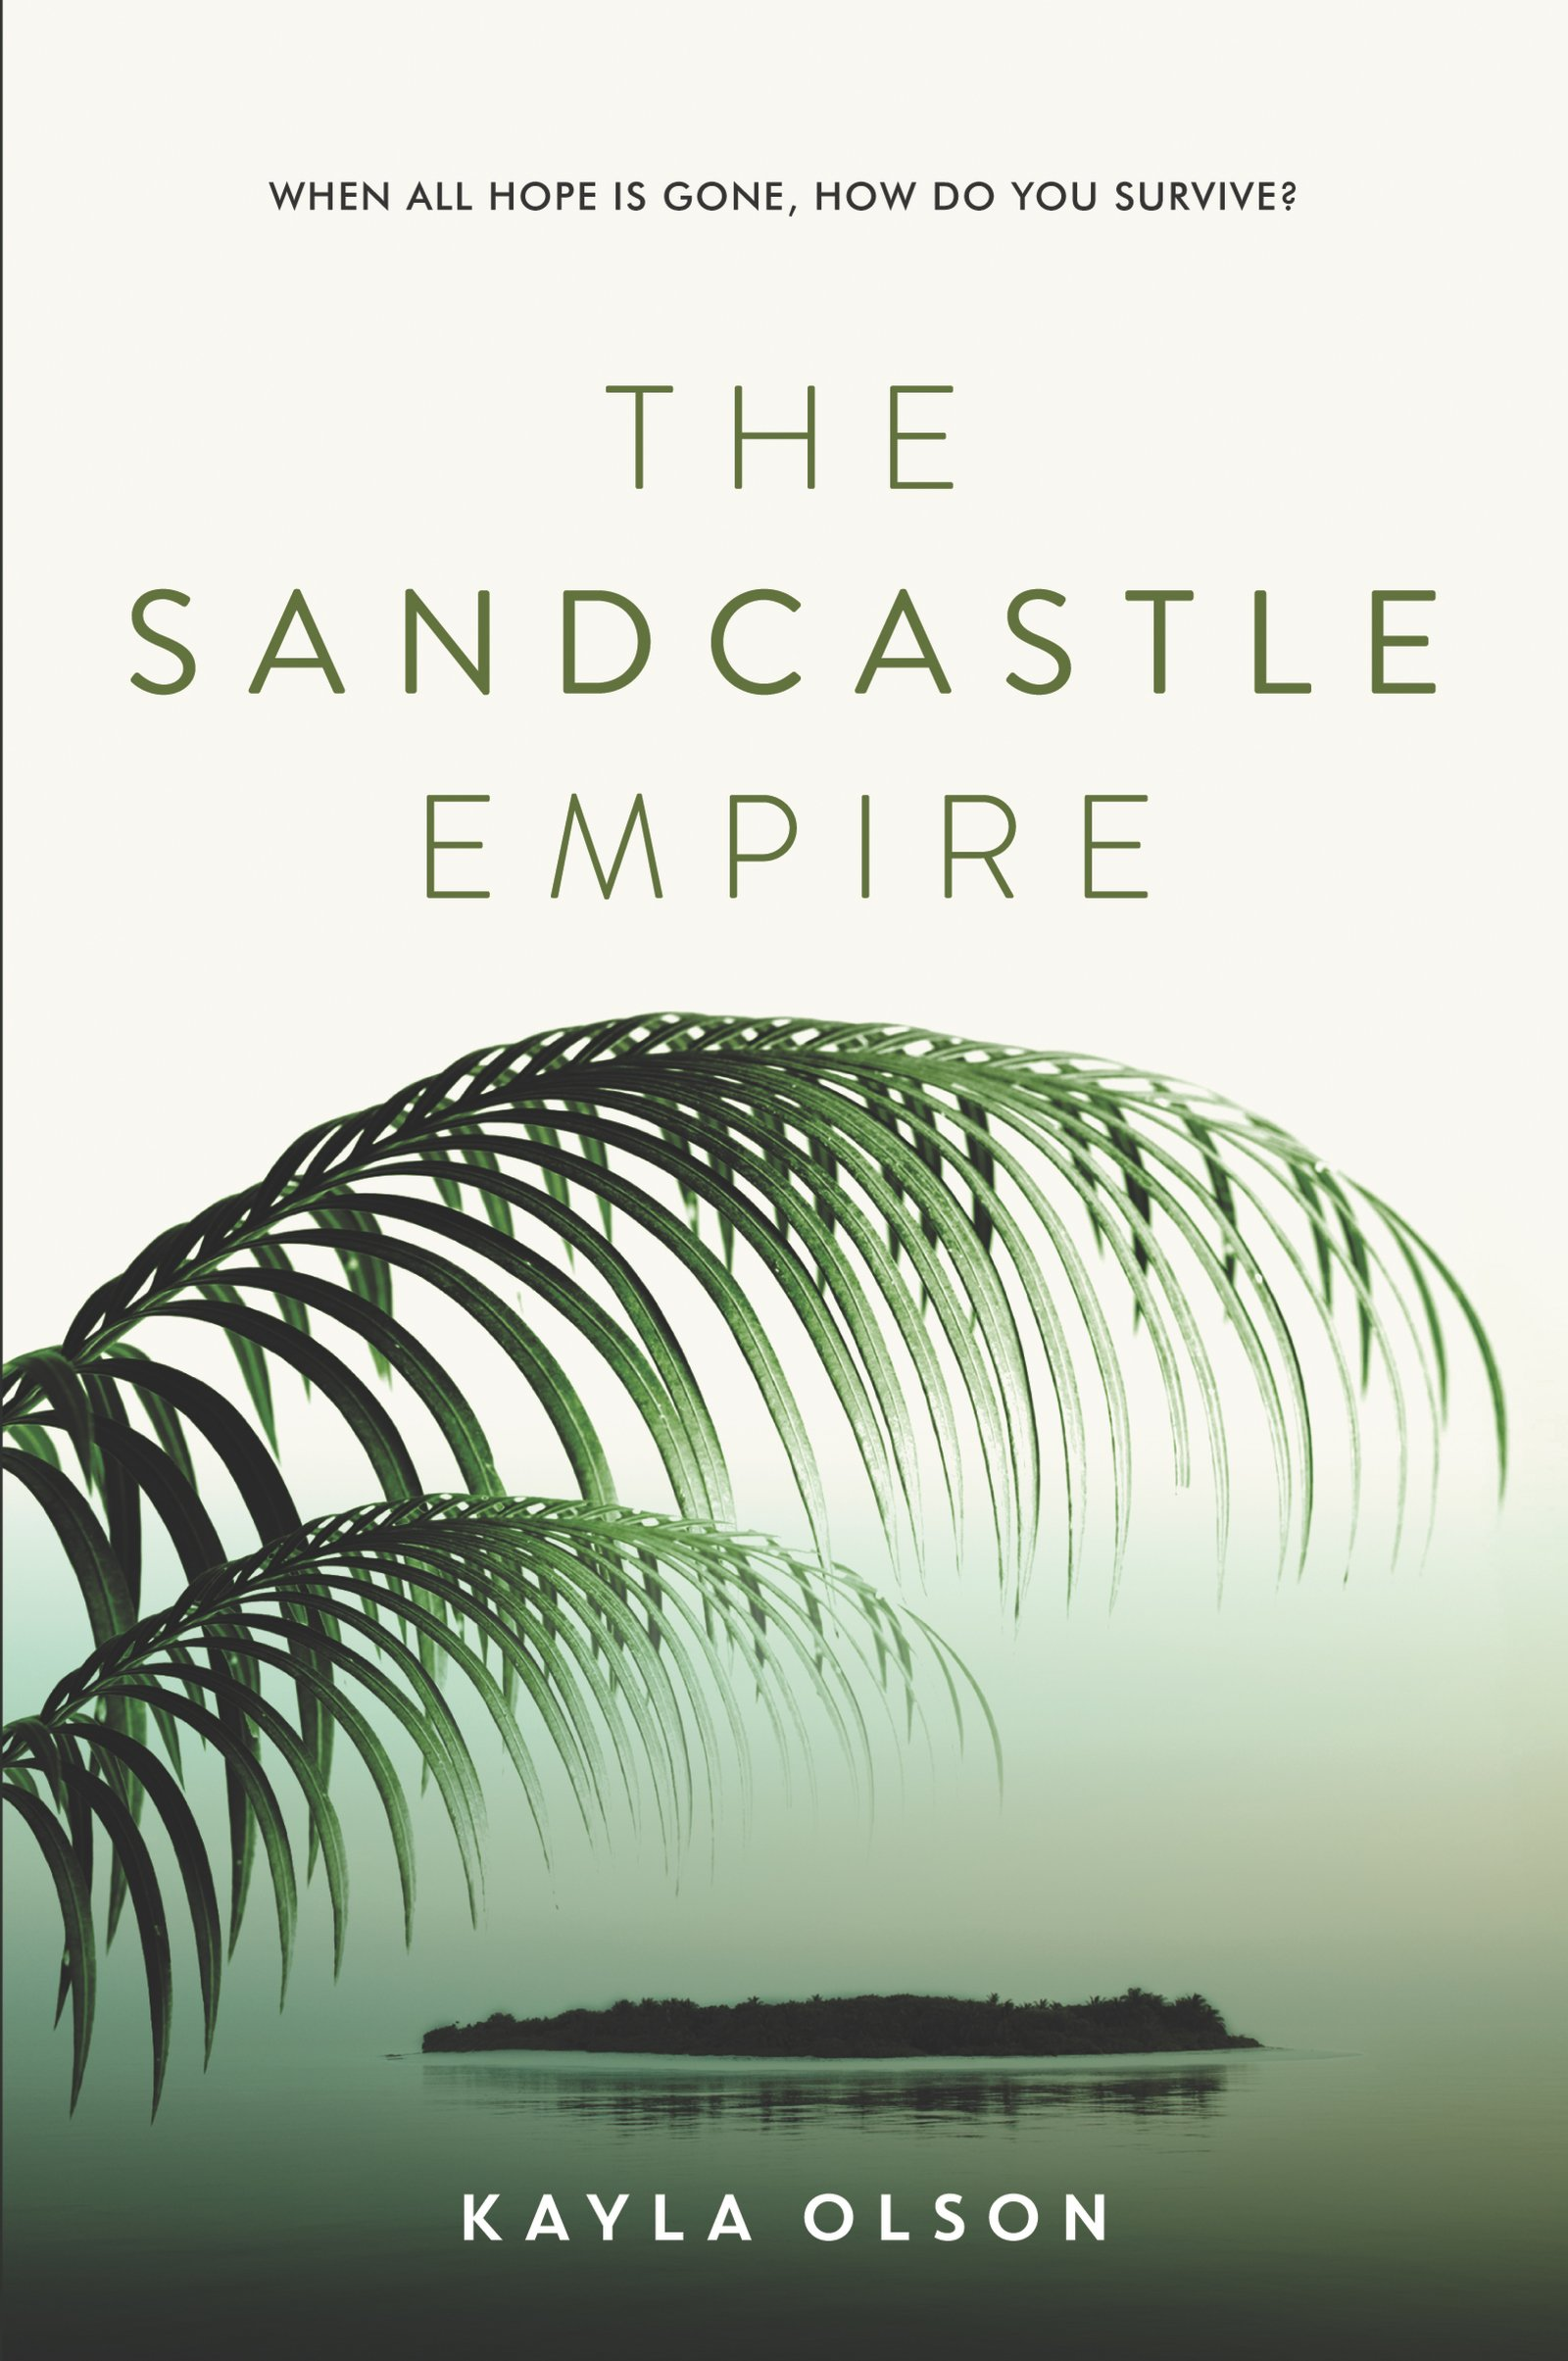 Amazon.com: The Sandcastle Empire (9780062484888): Olson, Kayla: Books